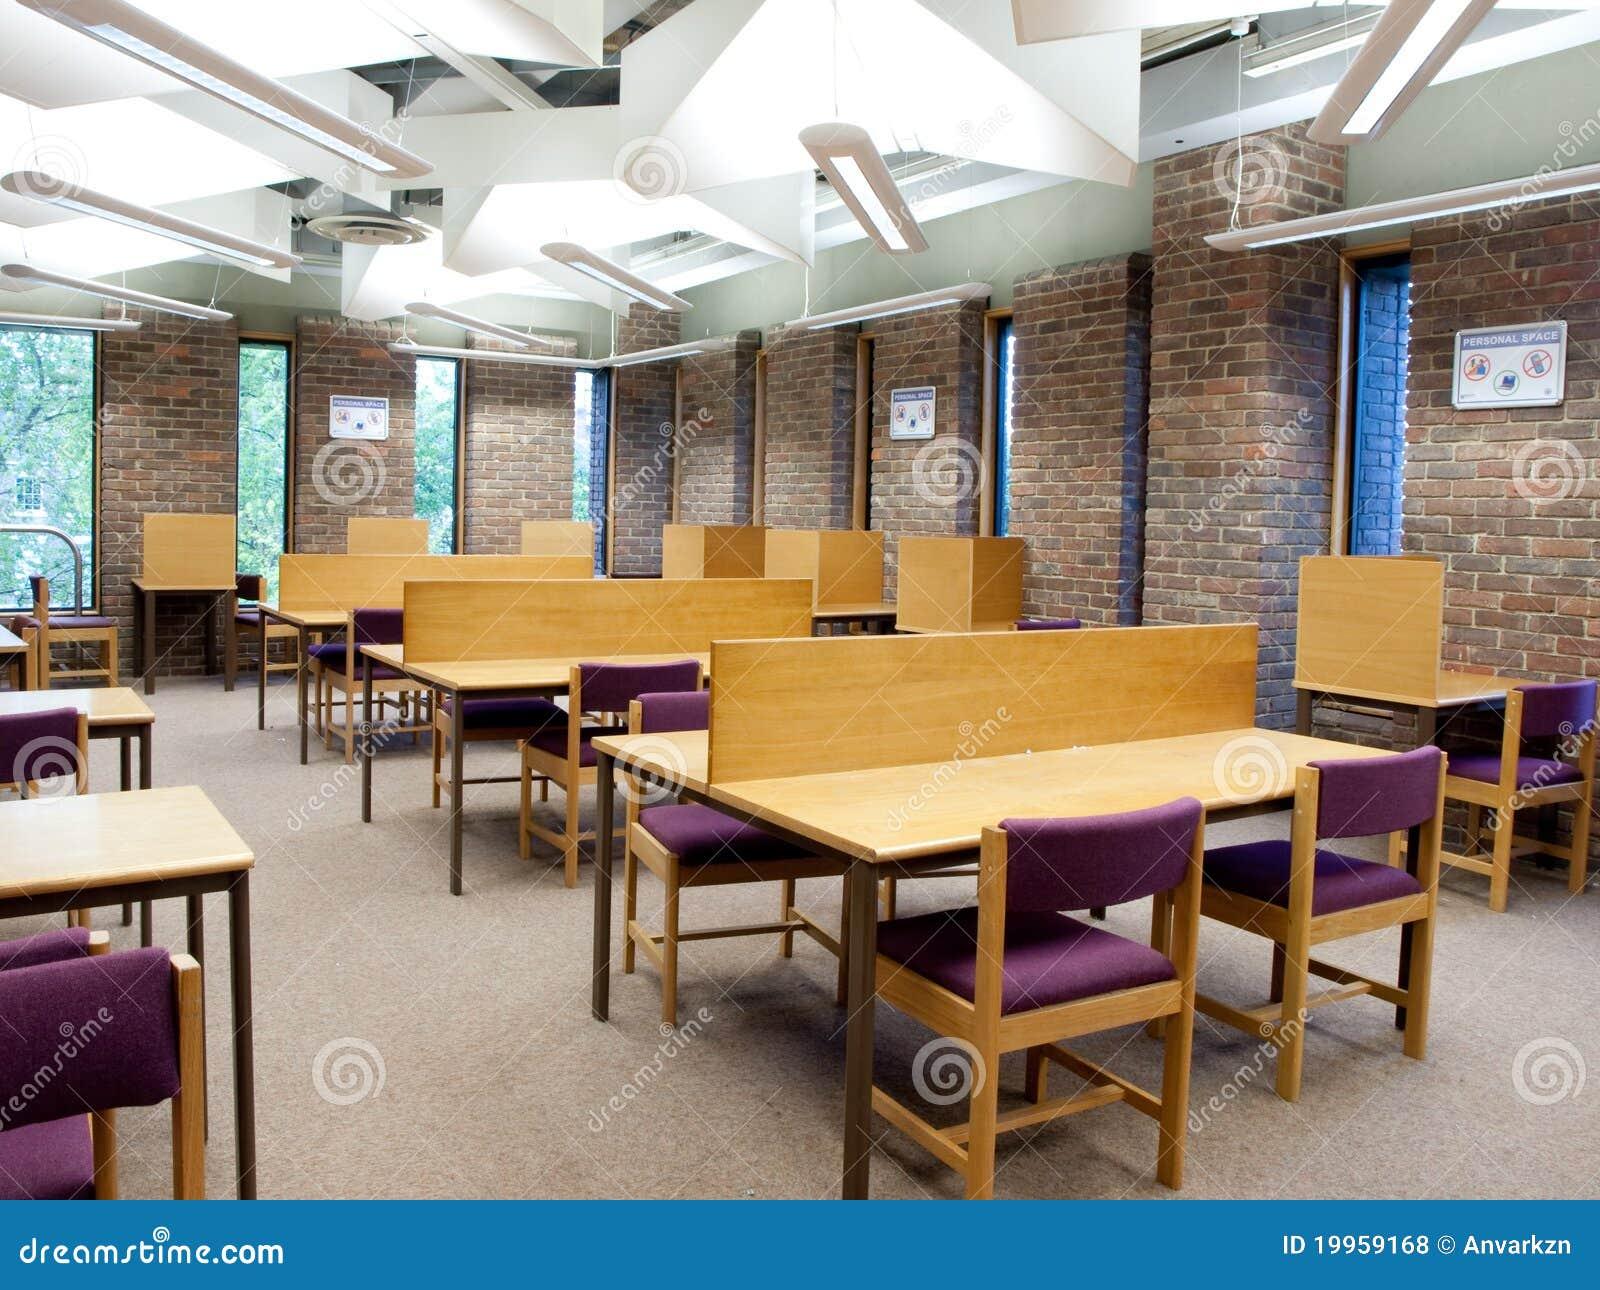 Areas of Study   Peninsula College